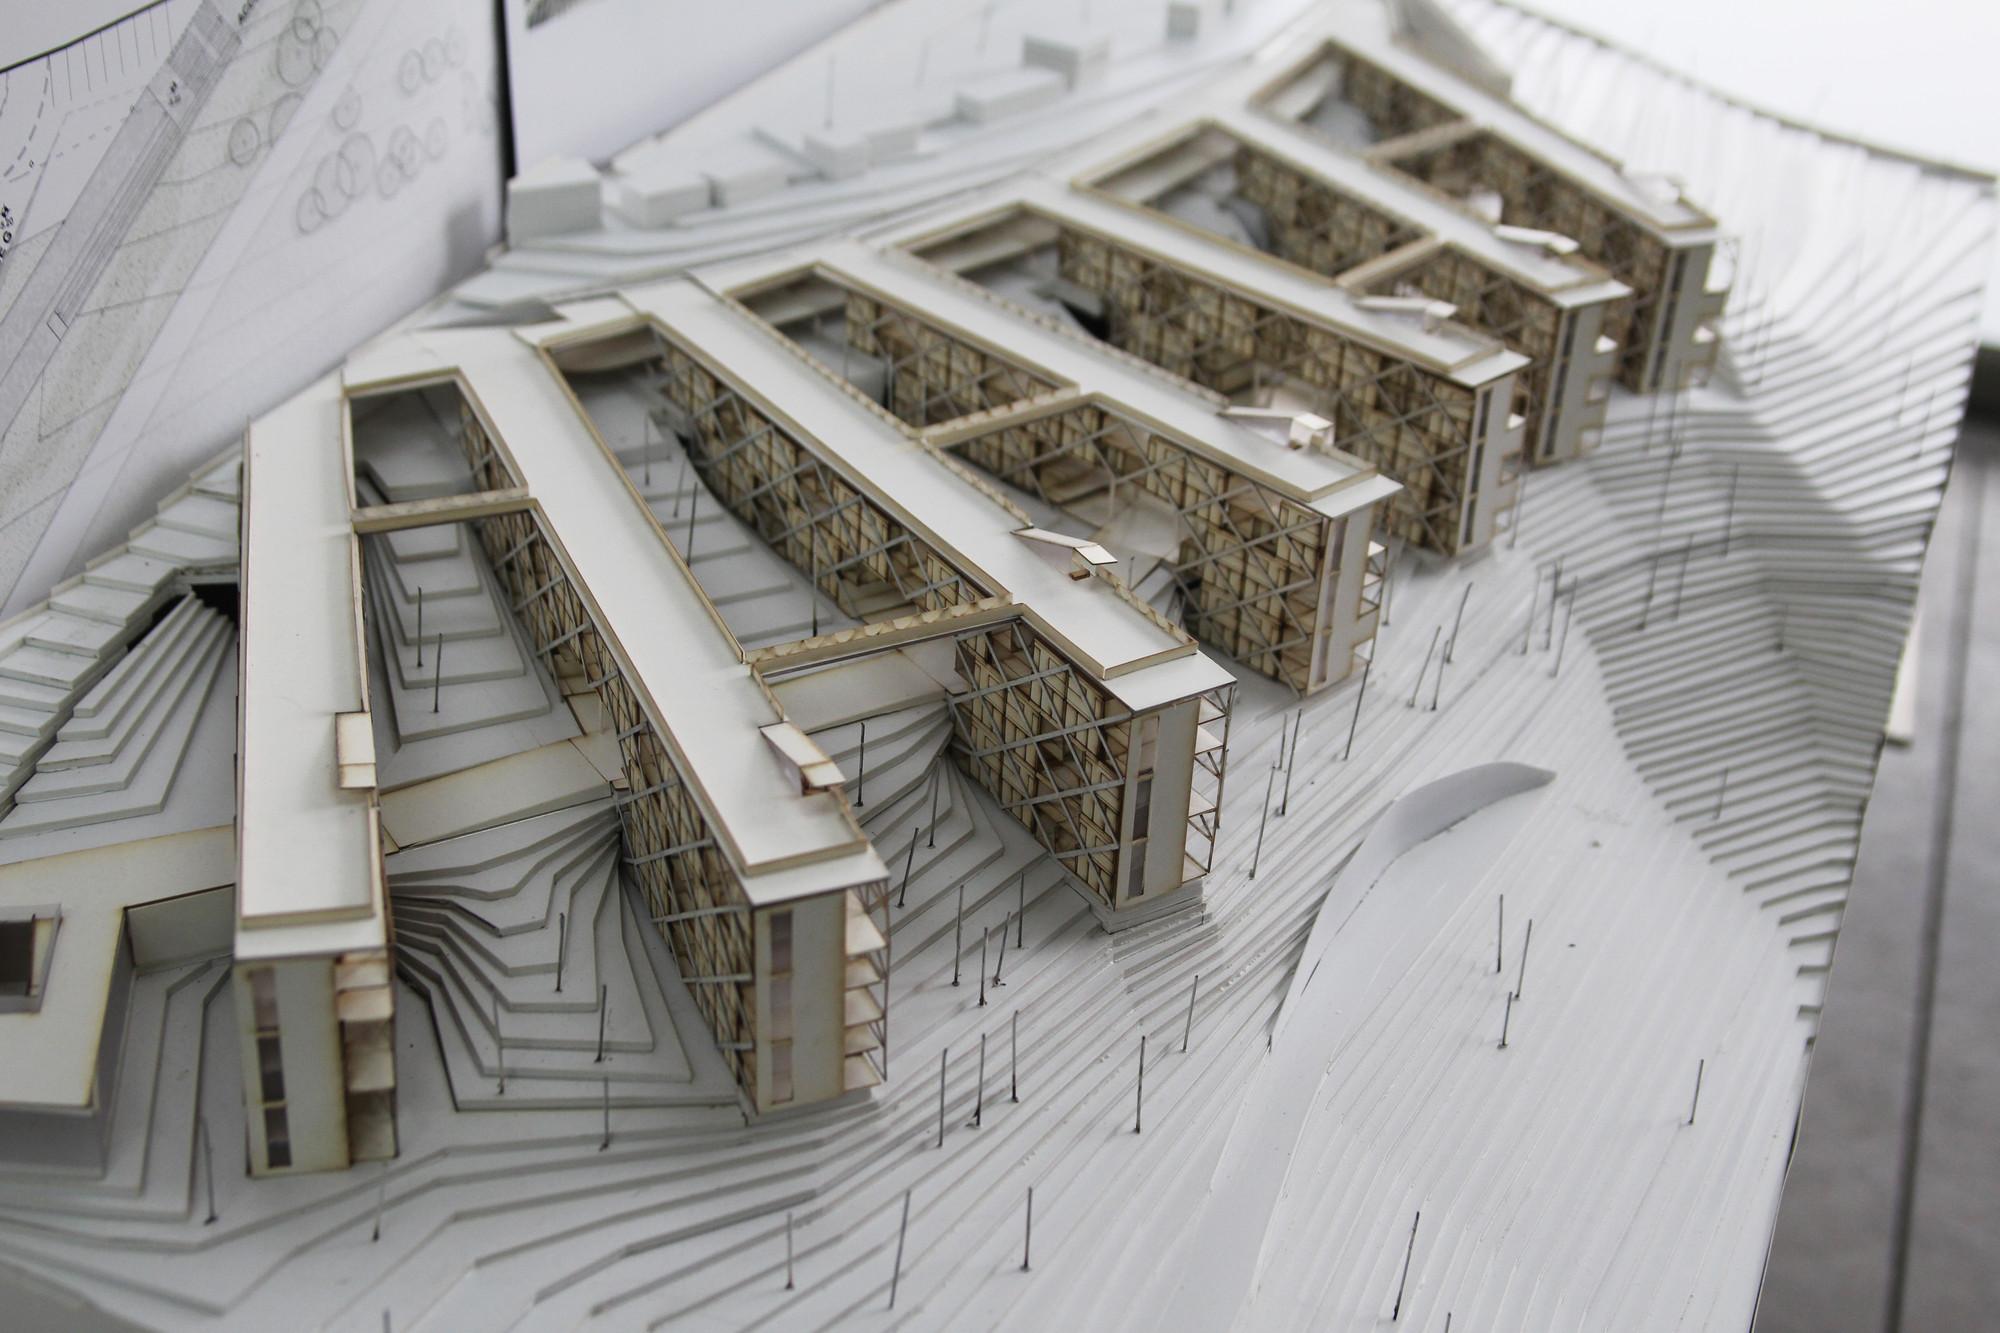 Segundo lugar xviii concurso cap 2014 vivienda social de for Vivienda arquitectura